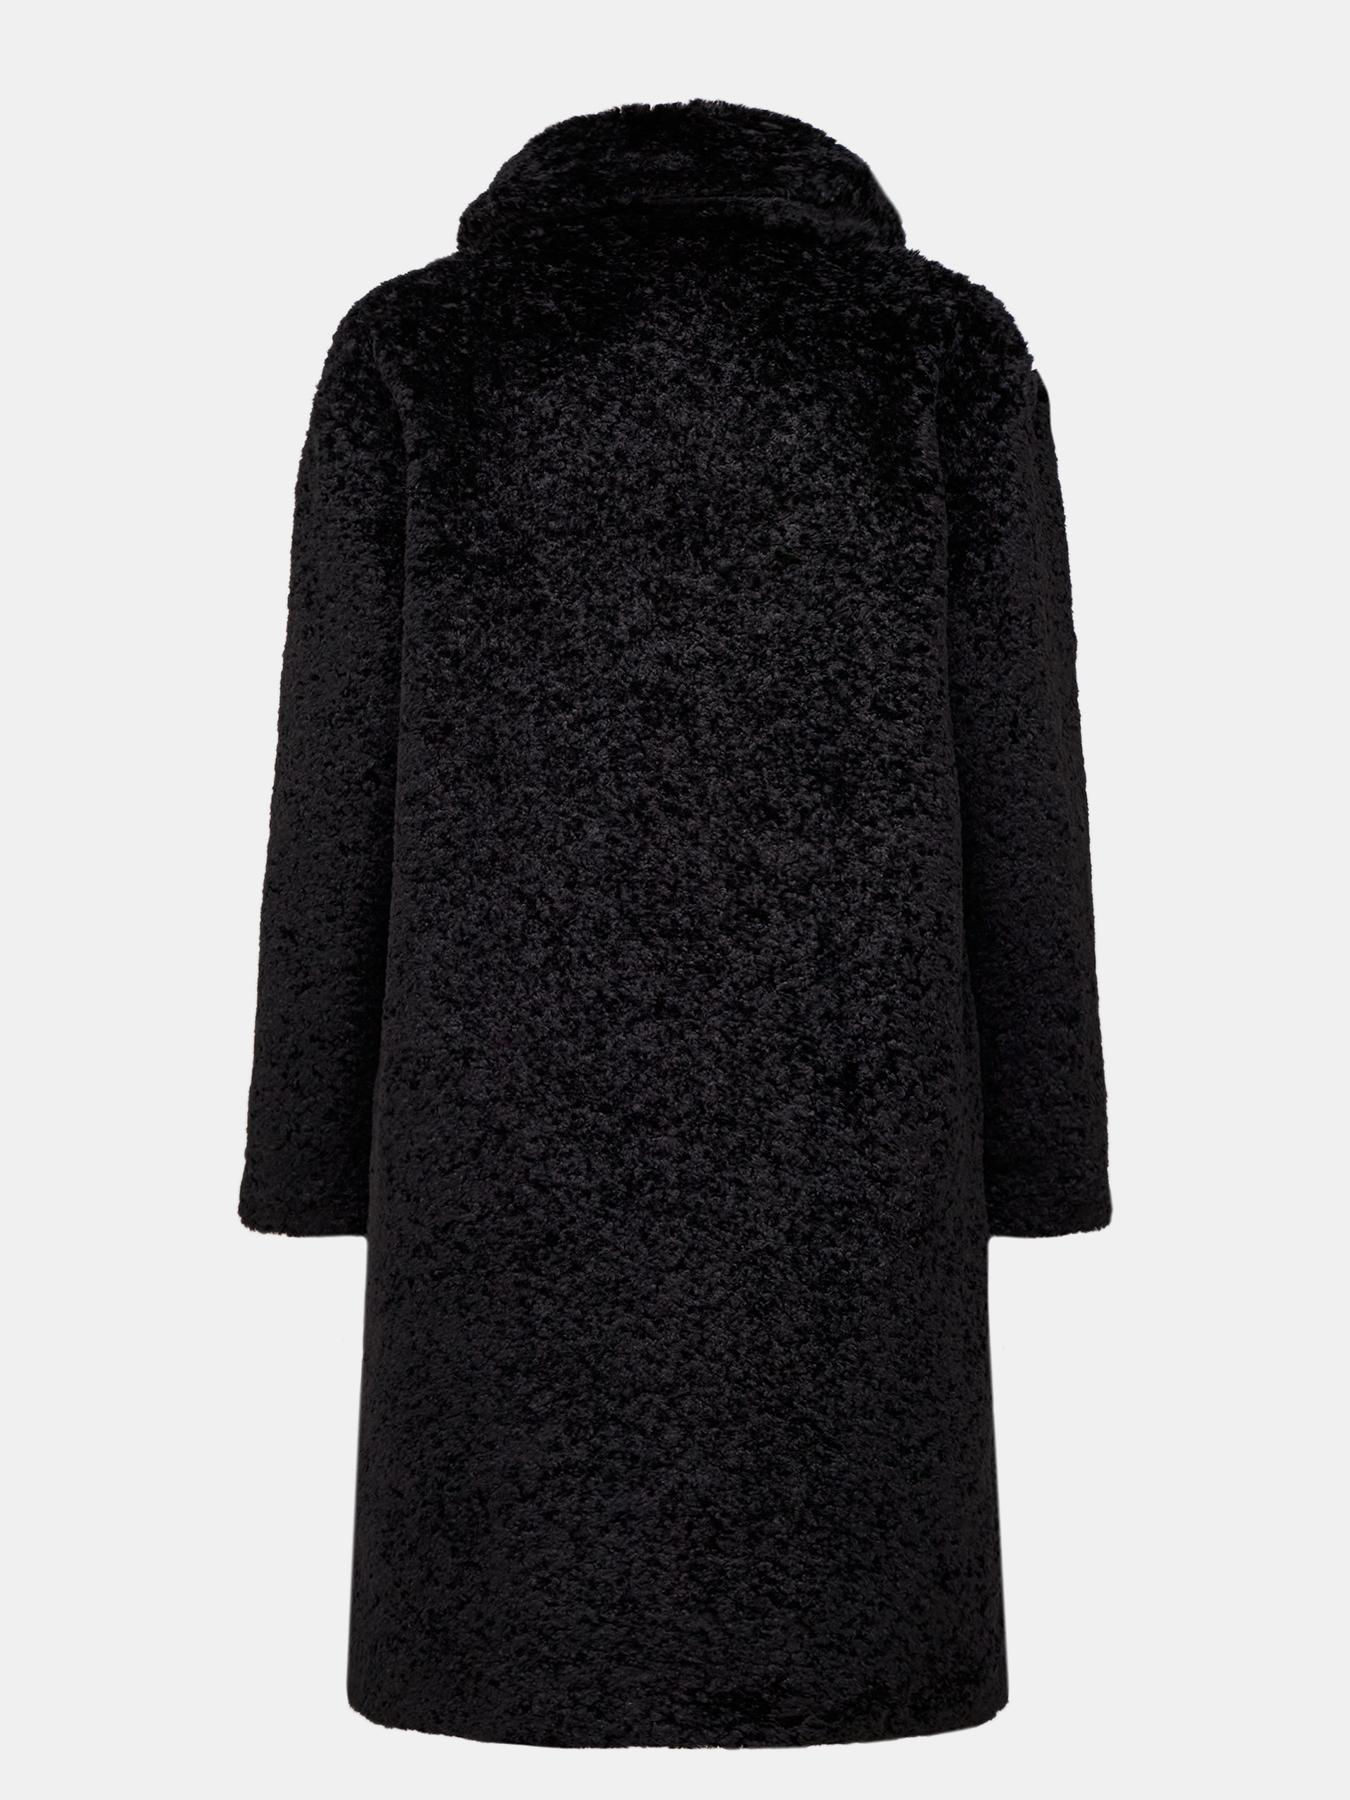 Пальто Trussardi Jeans Пальто пальто trussardi